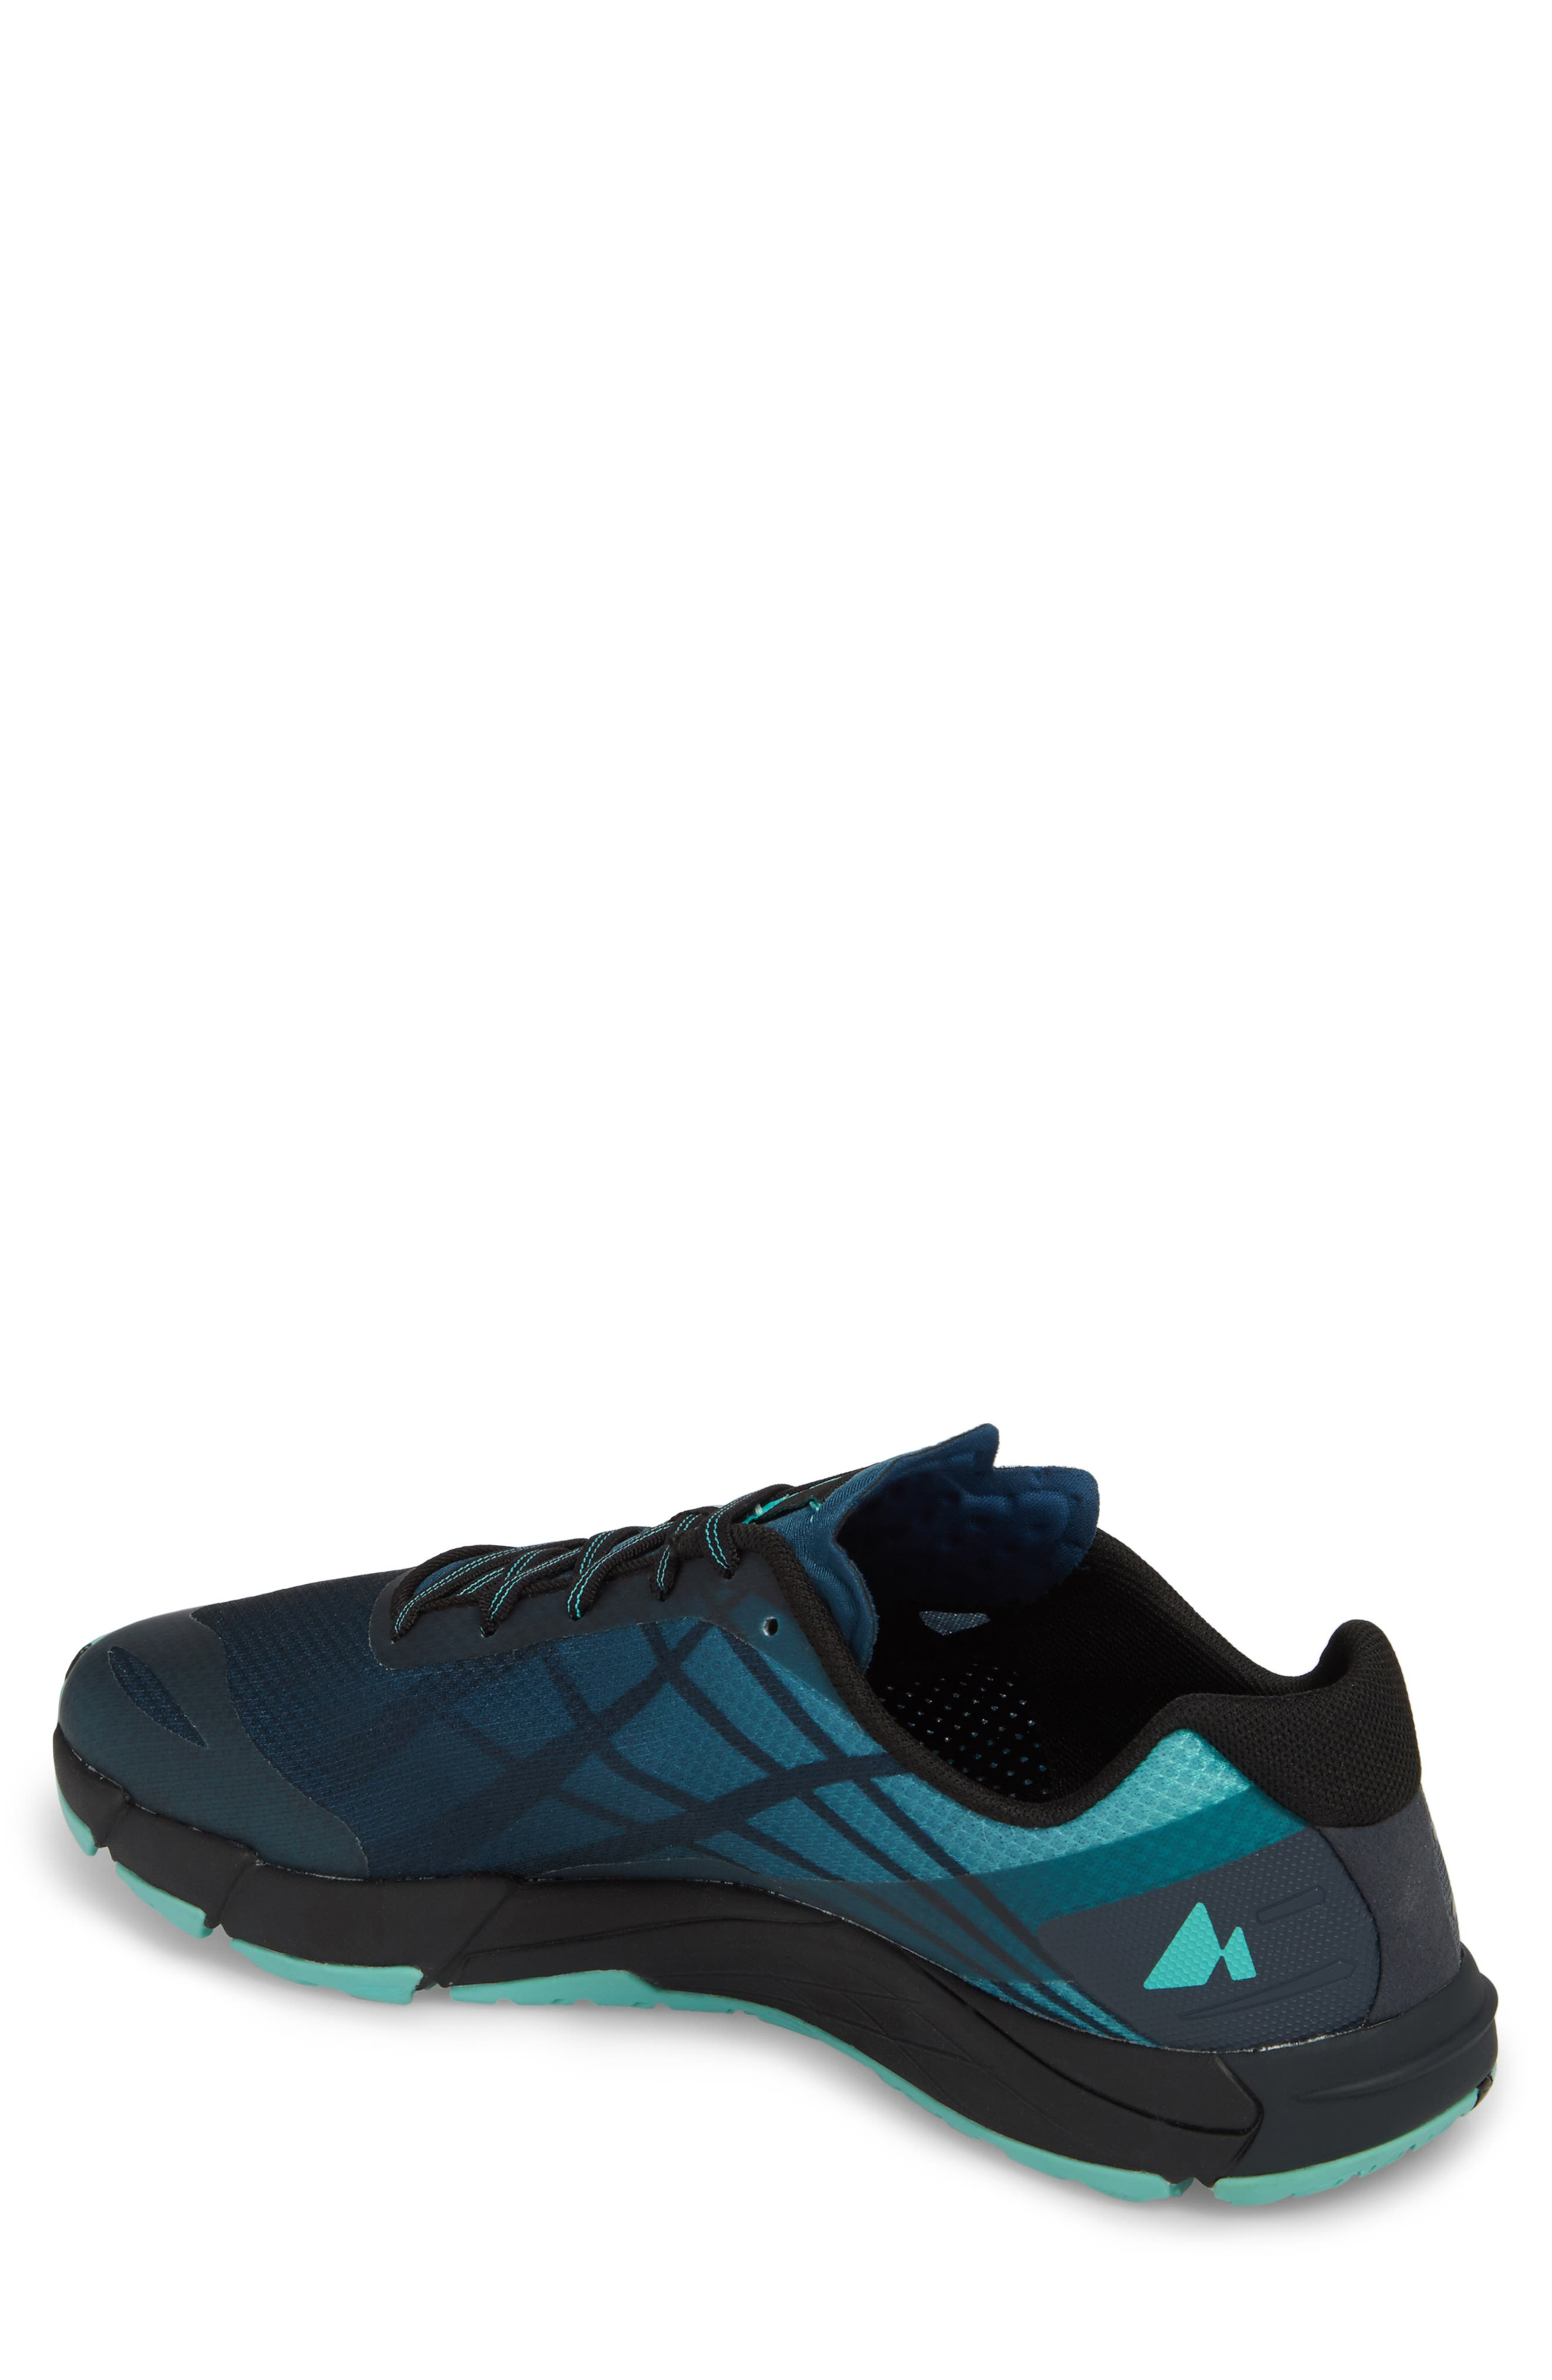 Bare Access Flex Running Shoe,                             Alternate thumbnail 4, color,